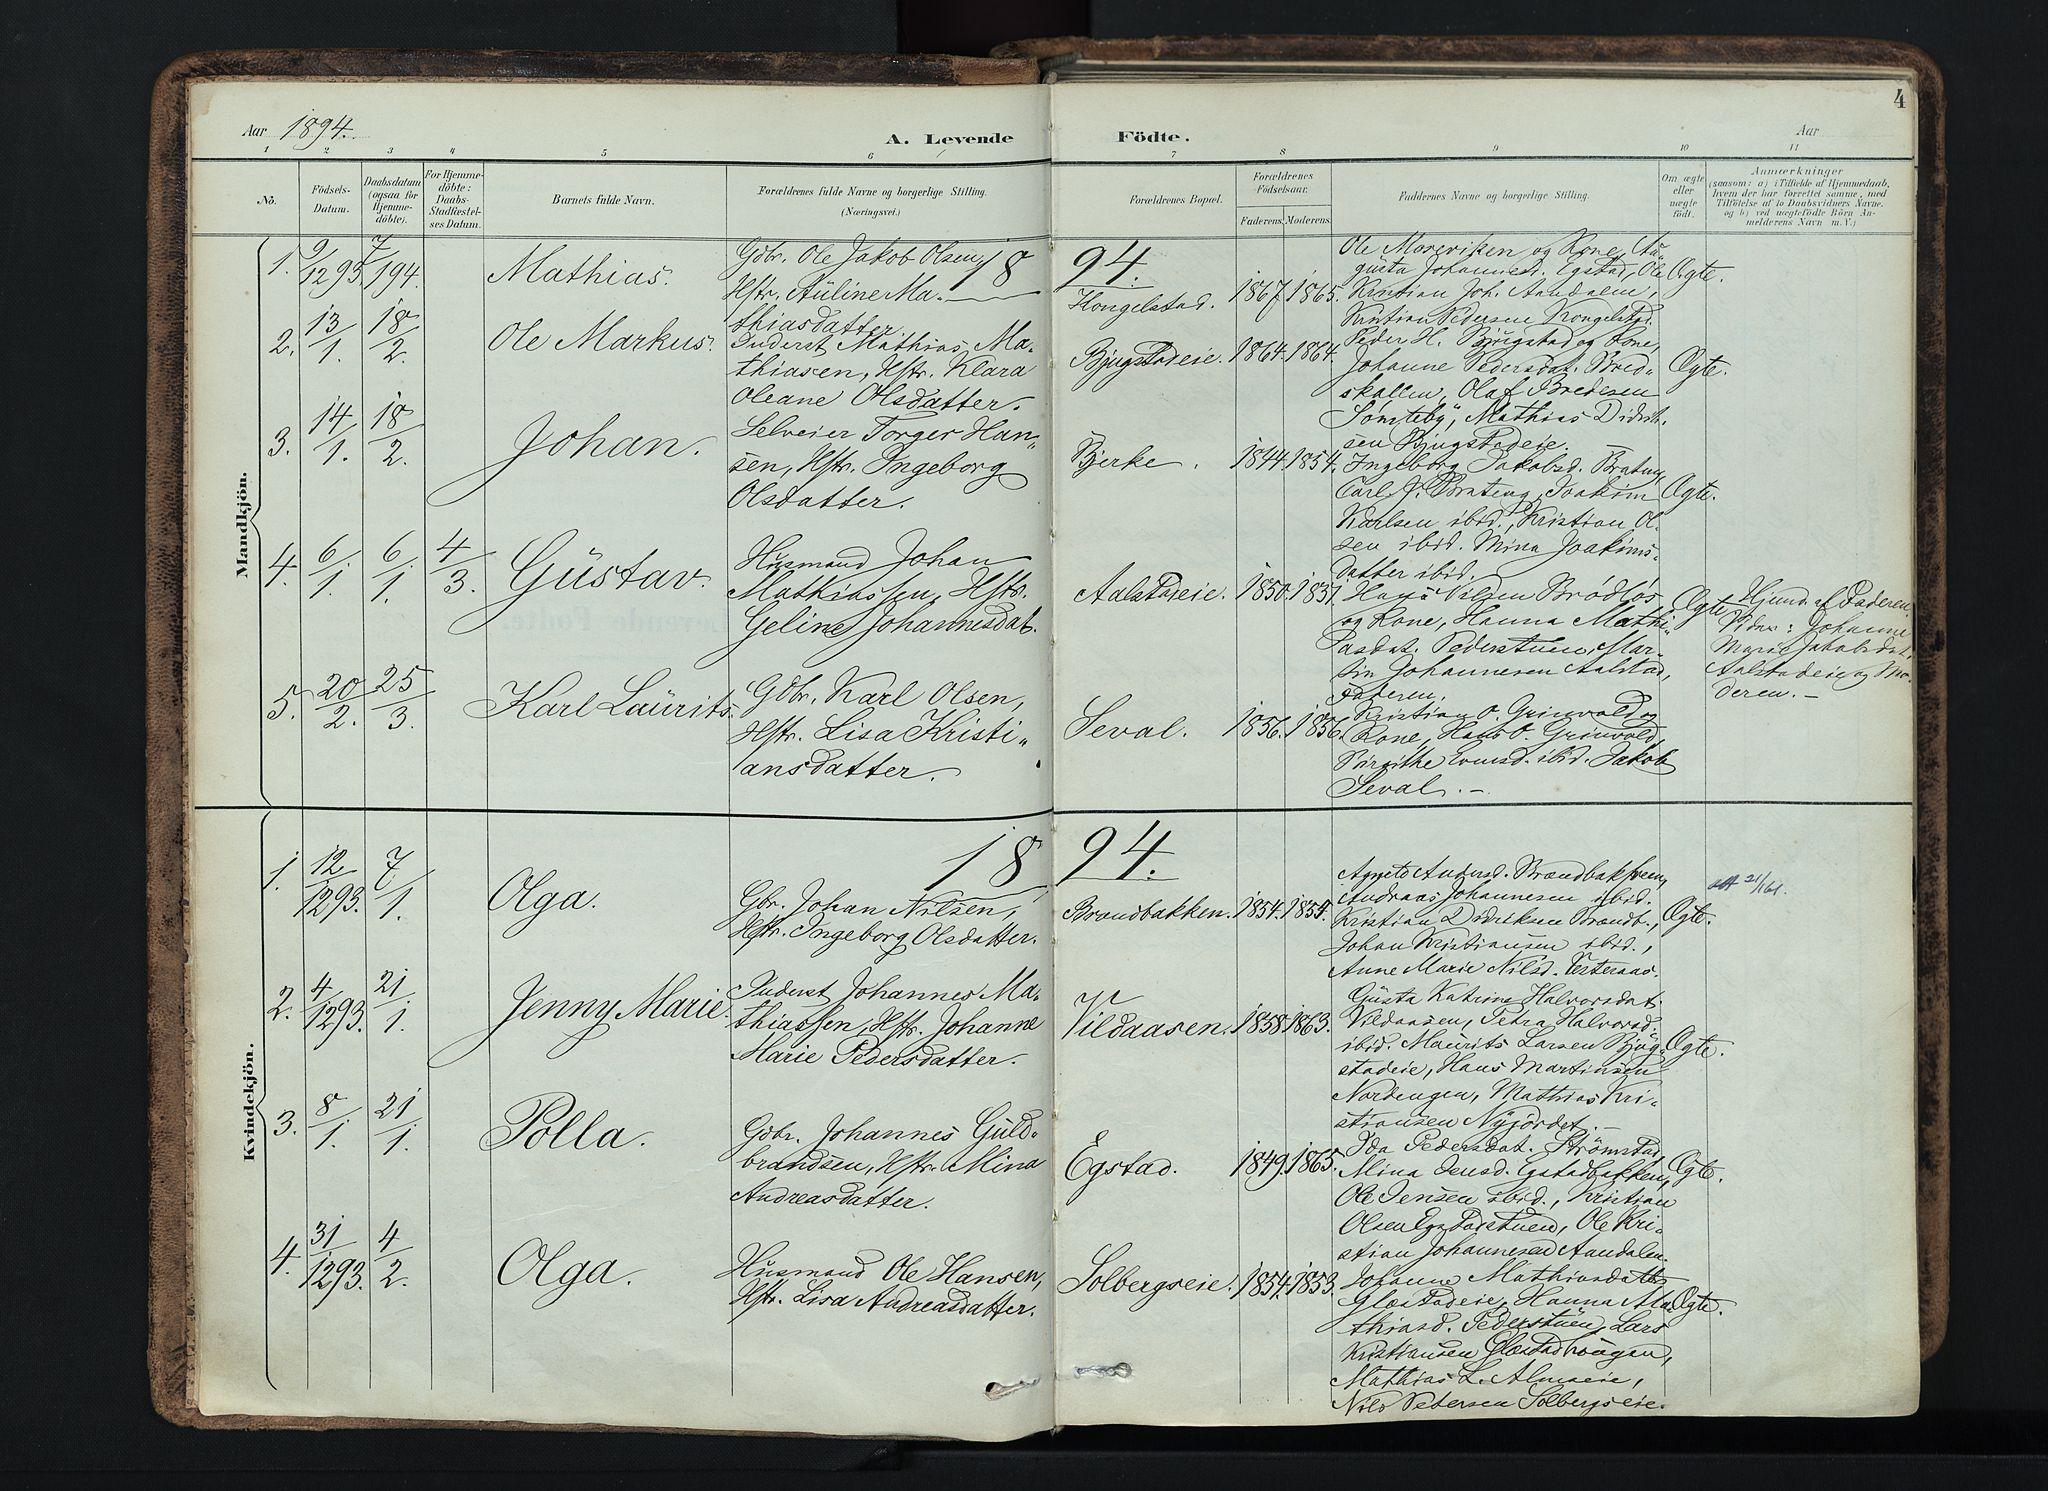 SAH, Vardal prestekontor, H/Ha/Haa/L0019: Ministerialbok nr. 19, 1893-1907, s. 4